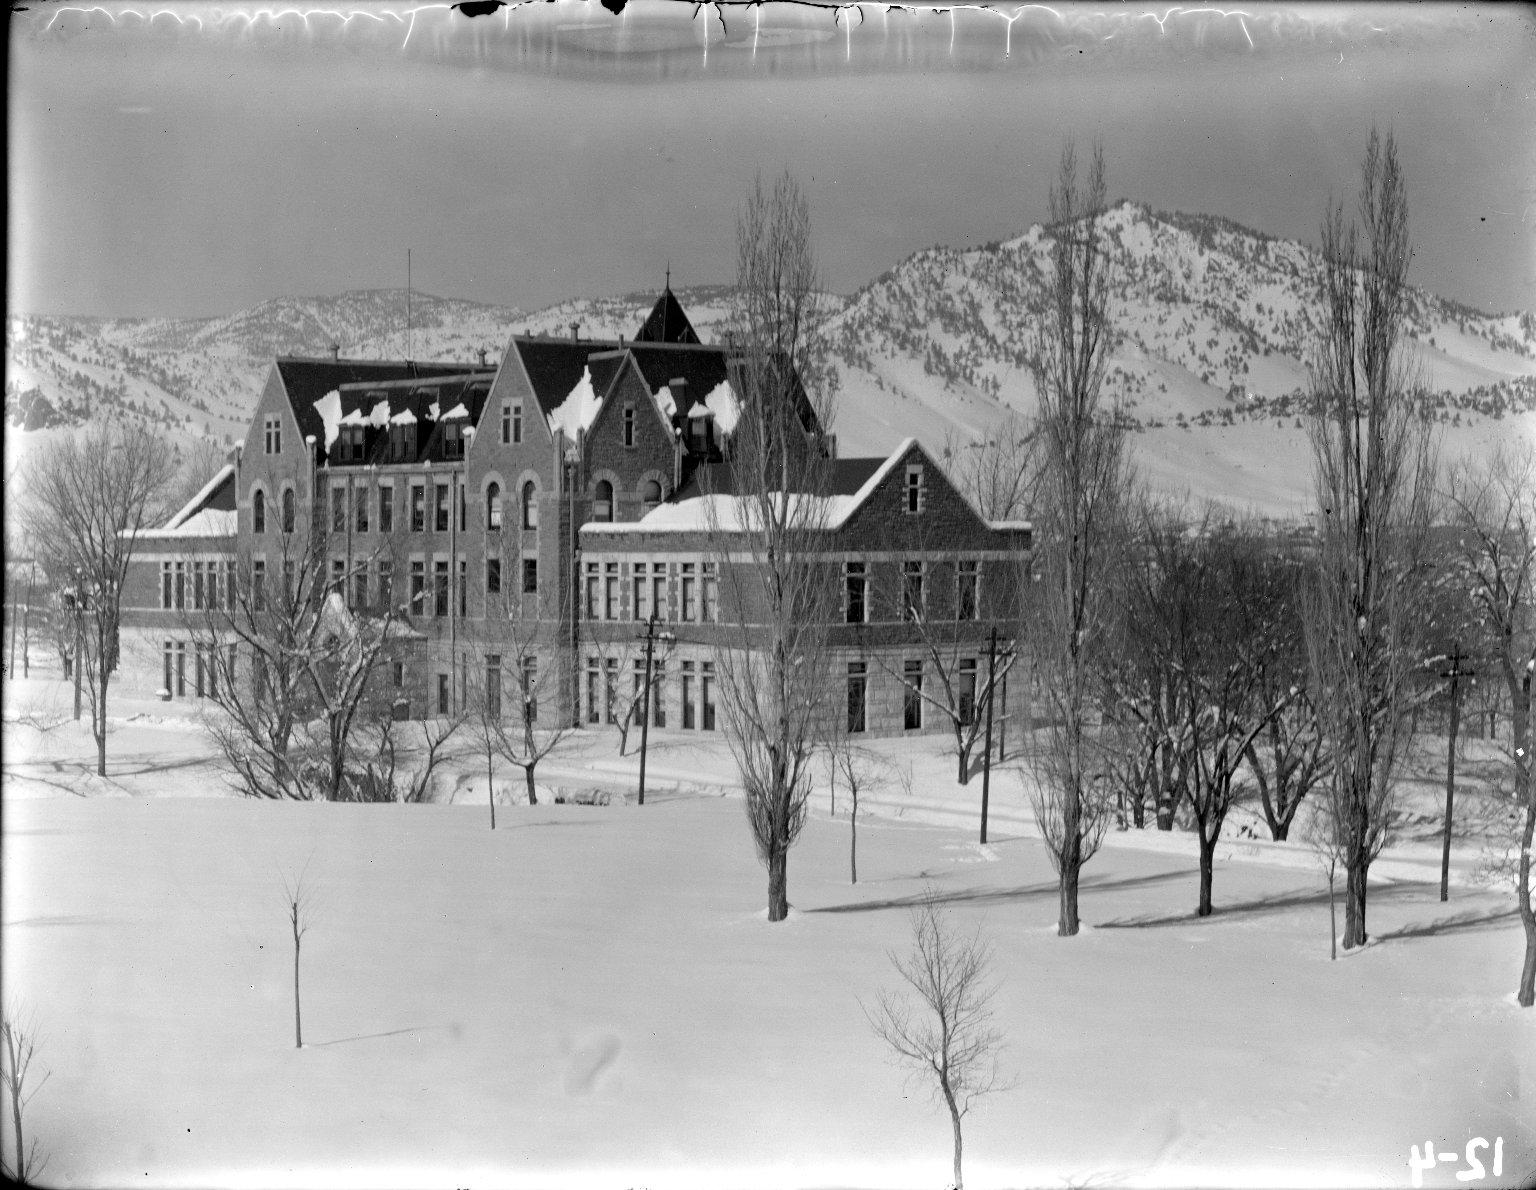 Hale W. Snow